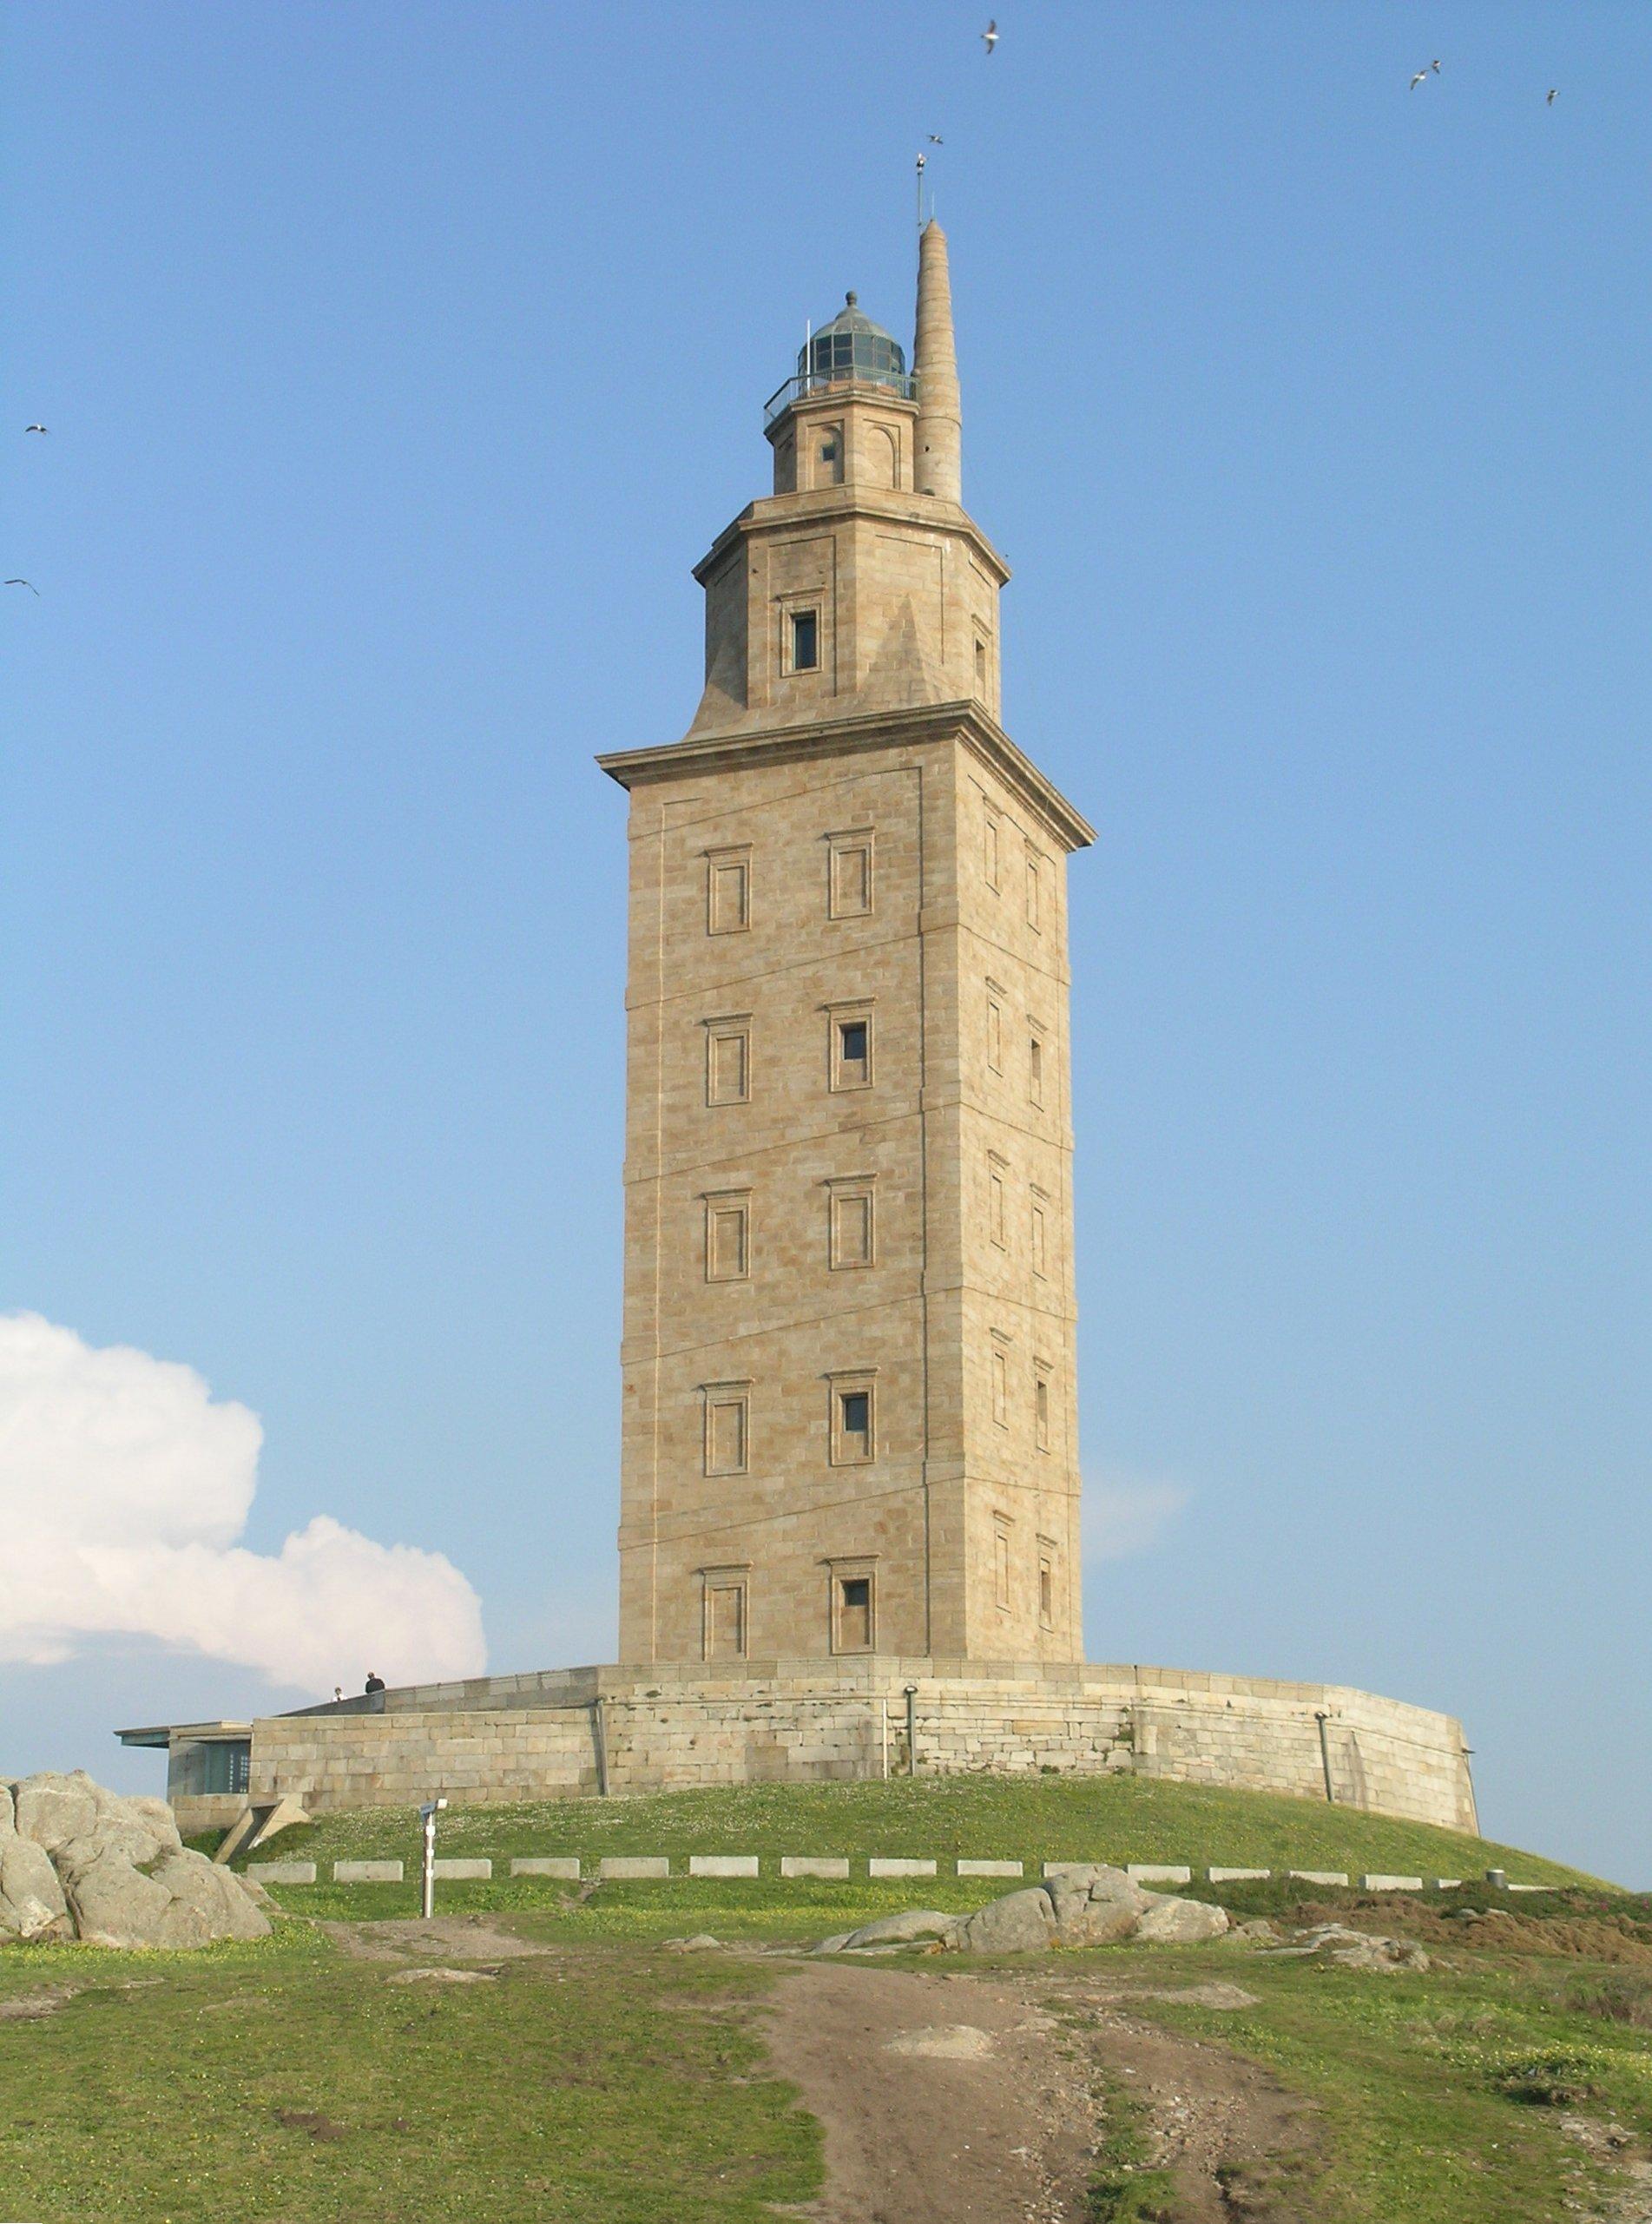 File:A coruna torre de hercules sunset edit.jpg